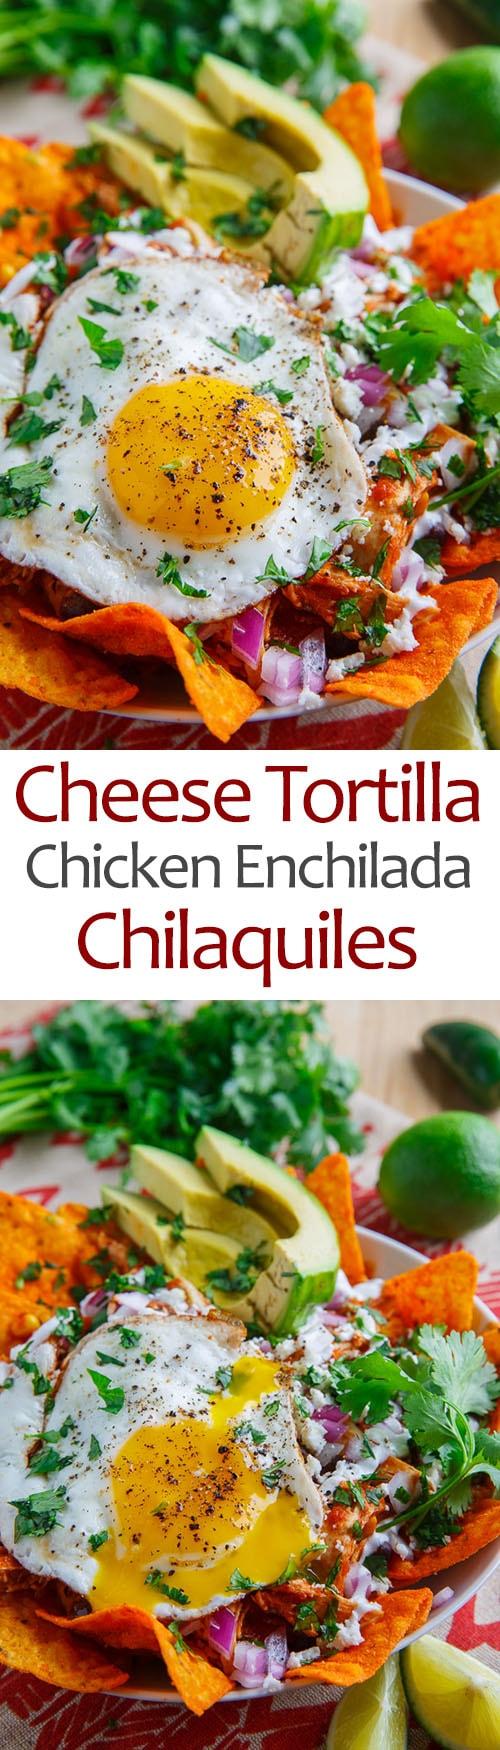 Cheese Tortilla Chip Chicken Enchilada Chilaquiles